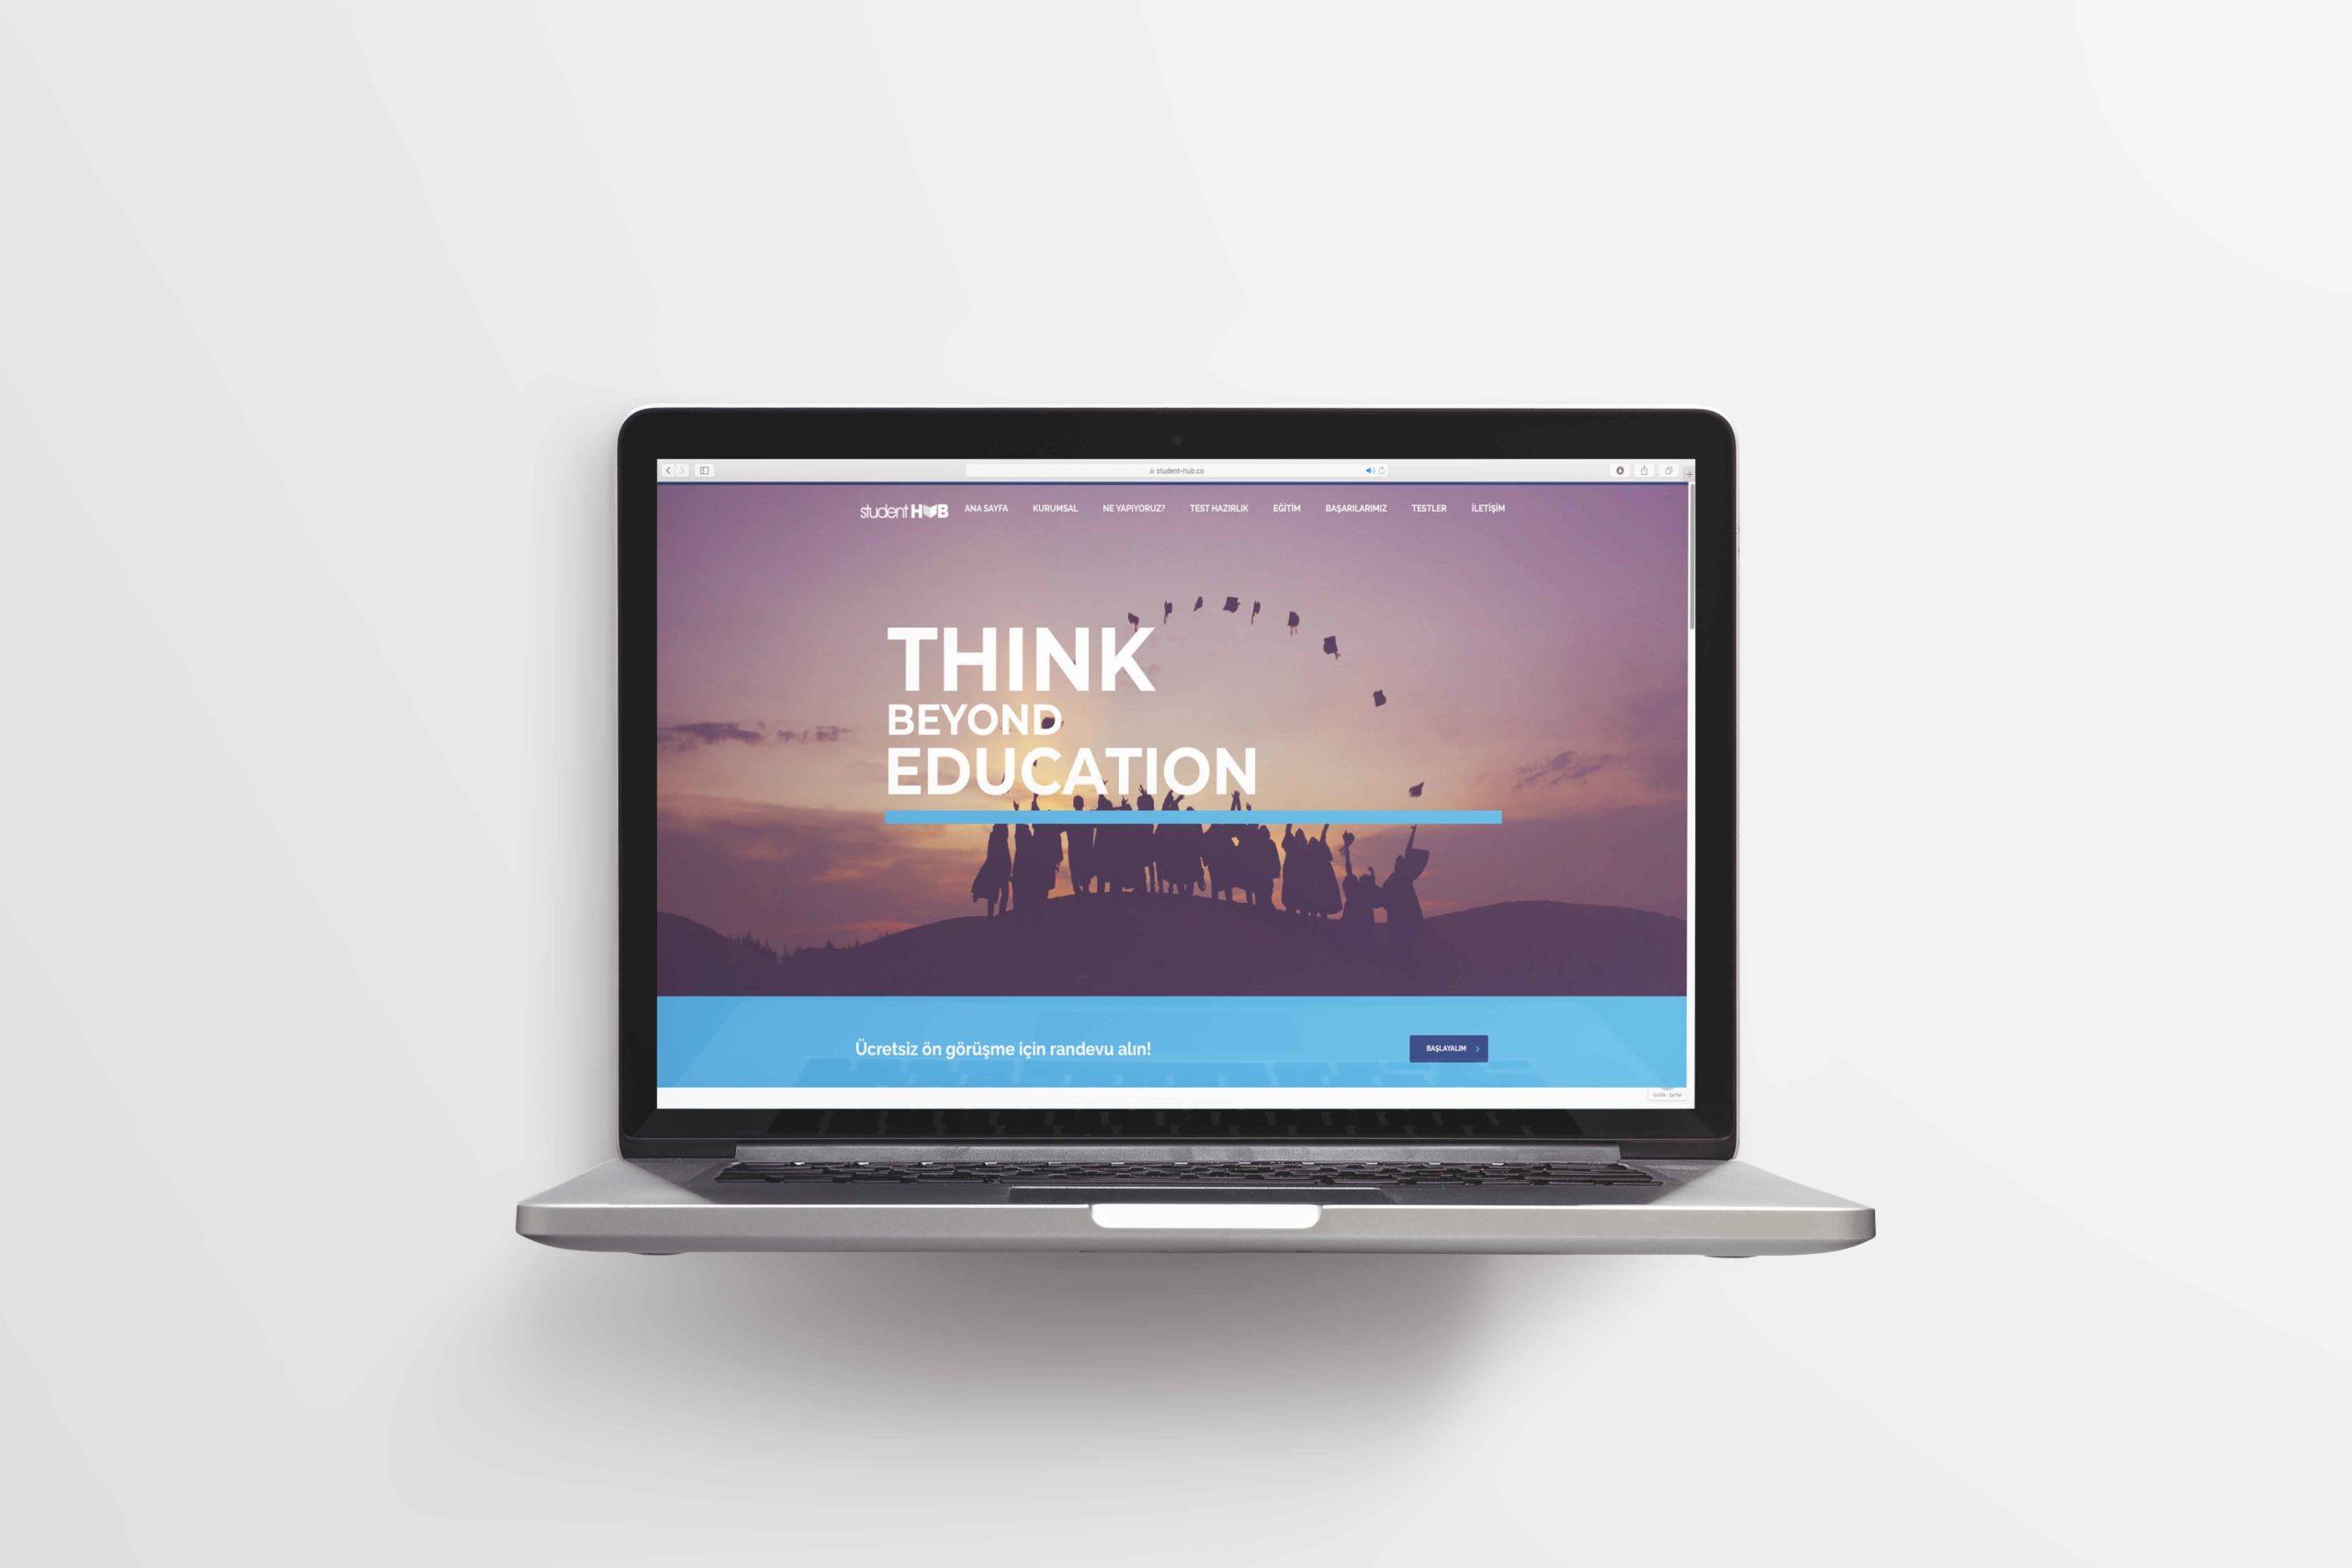 https://rdmedya.com/wp-content/uploads/2020/04/student-hub-web-design1-scaled.jpg